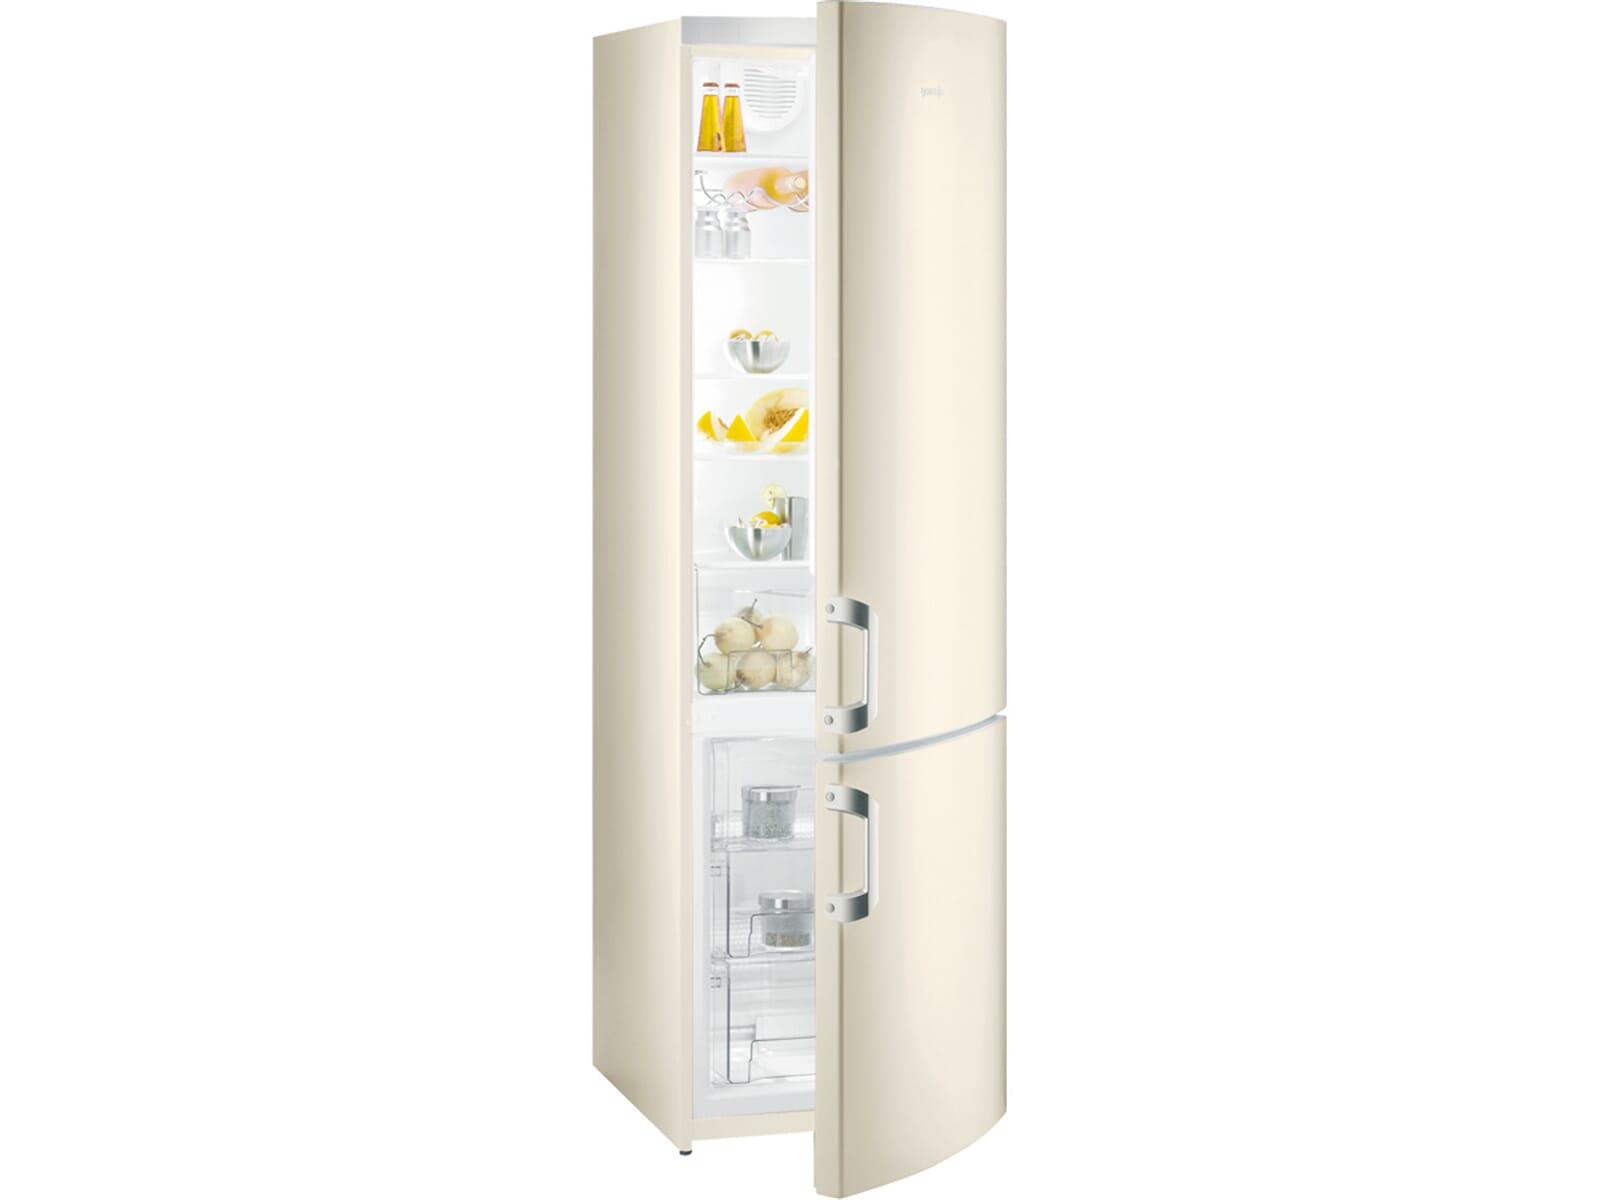 Gorenje R6193lx Kühlschrank : Kühlschrank gorenje gorenje heute ist der offizielle